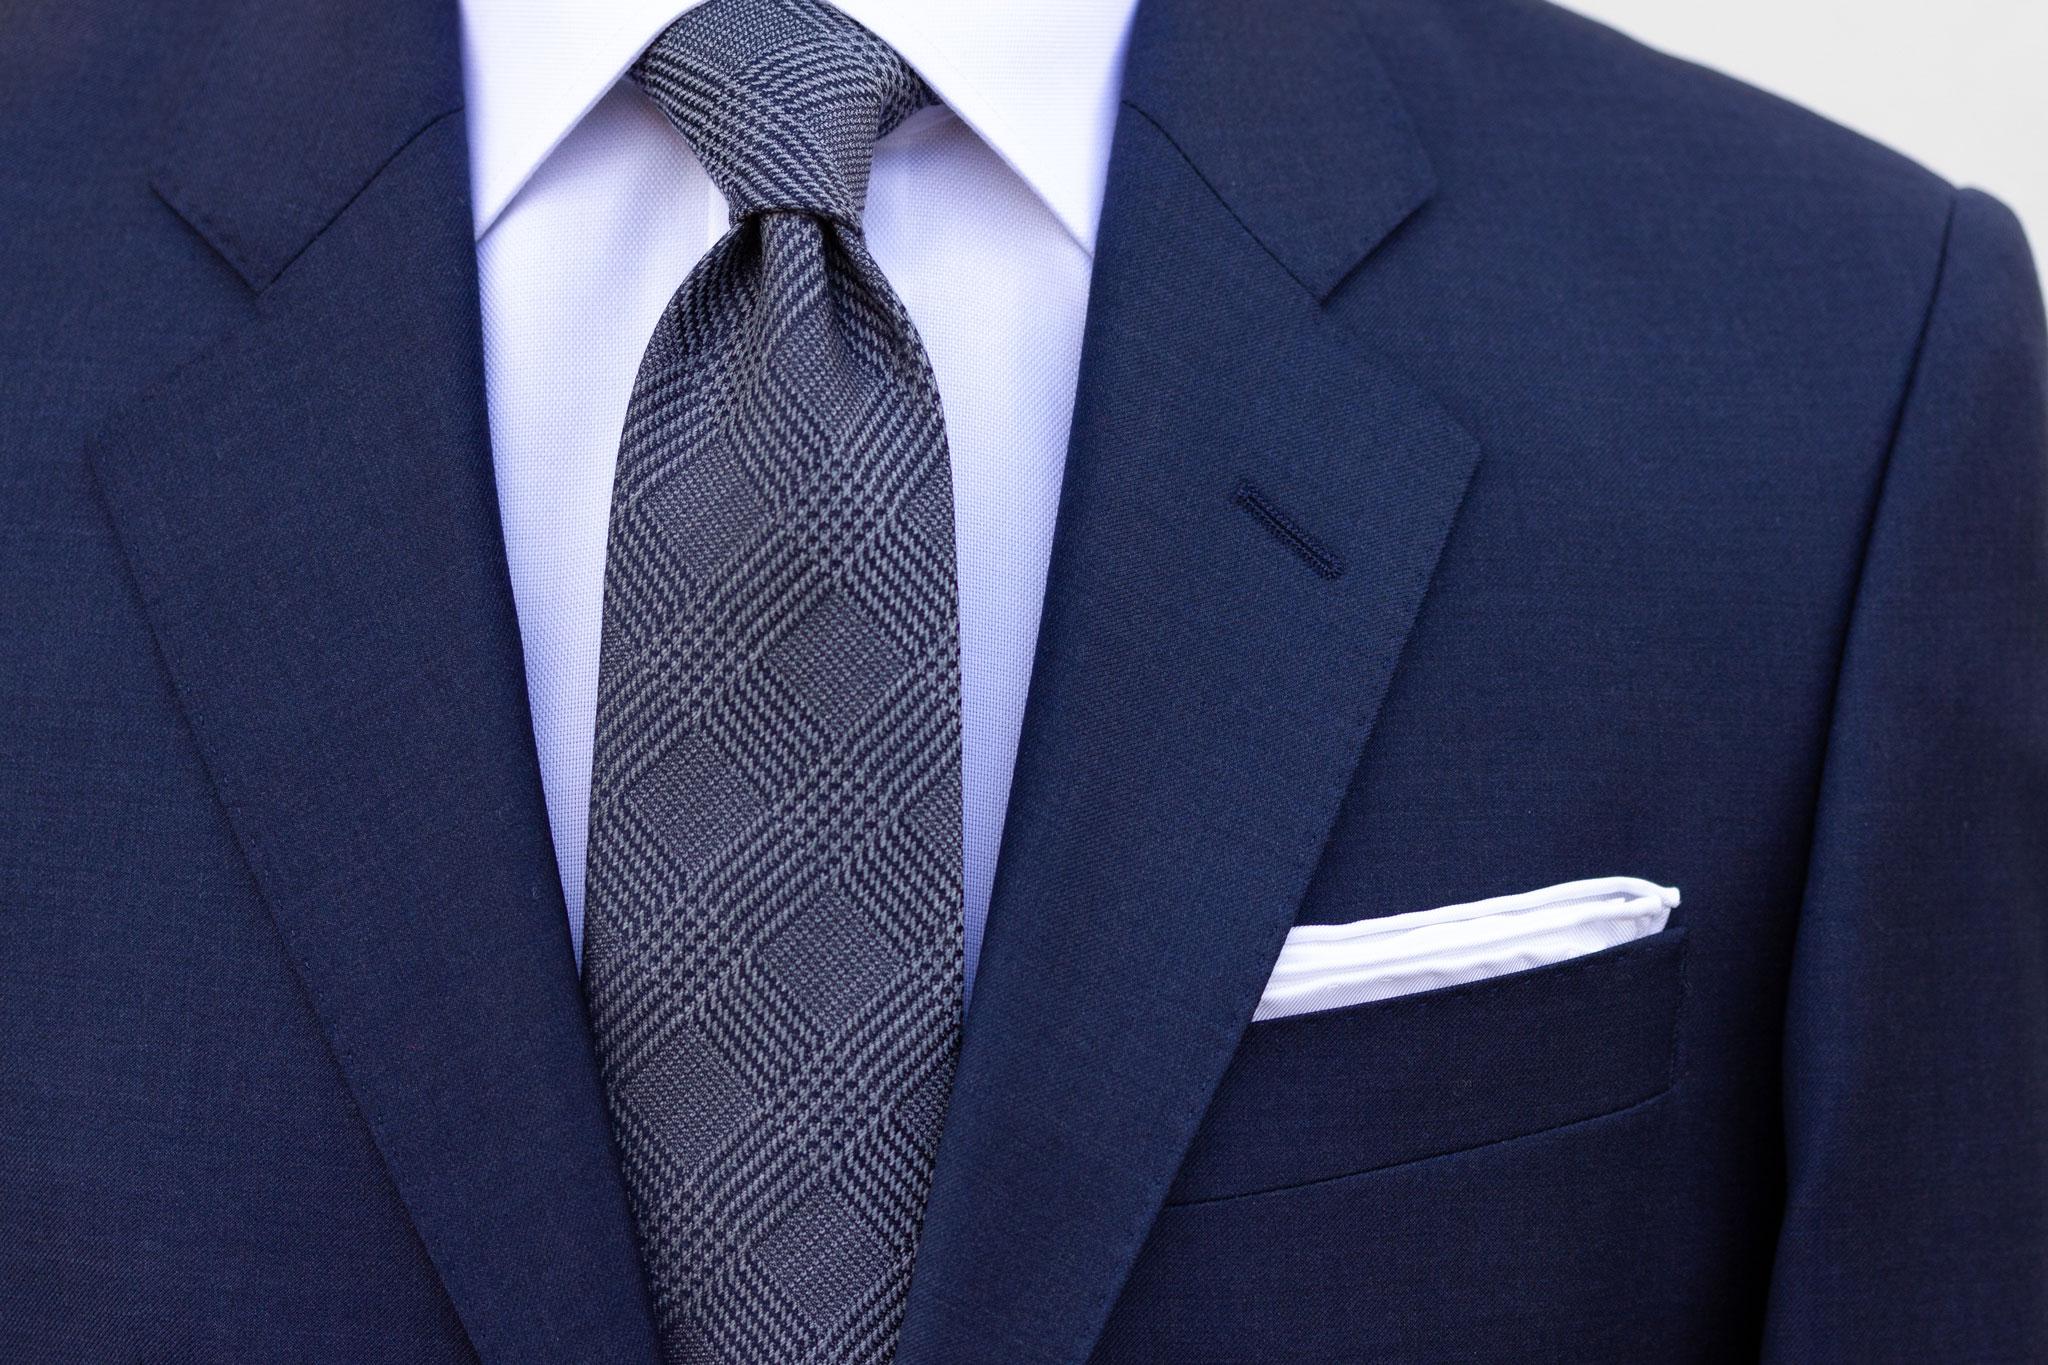 Mørkeblå melert dress med Super 130's stoff fra Cerruti. Dress Oslo og Trondheim